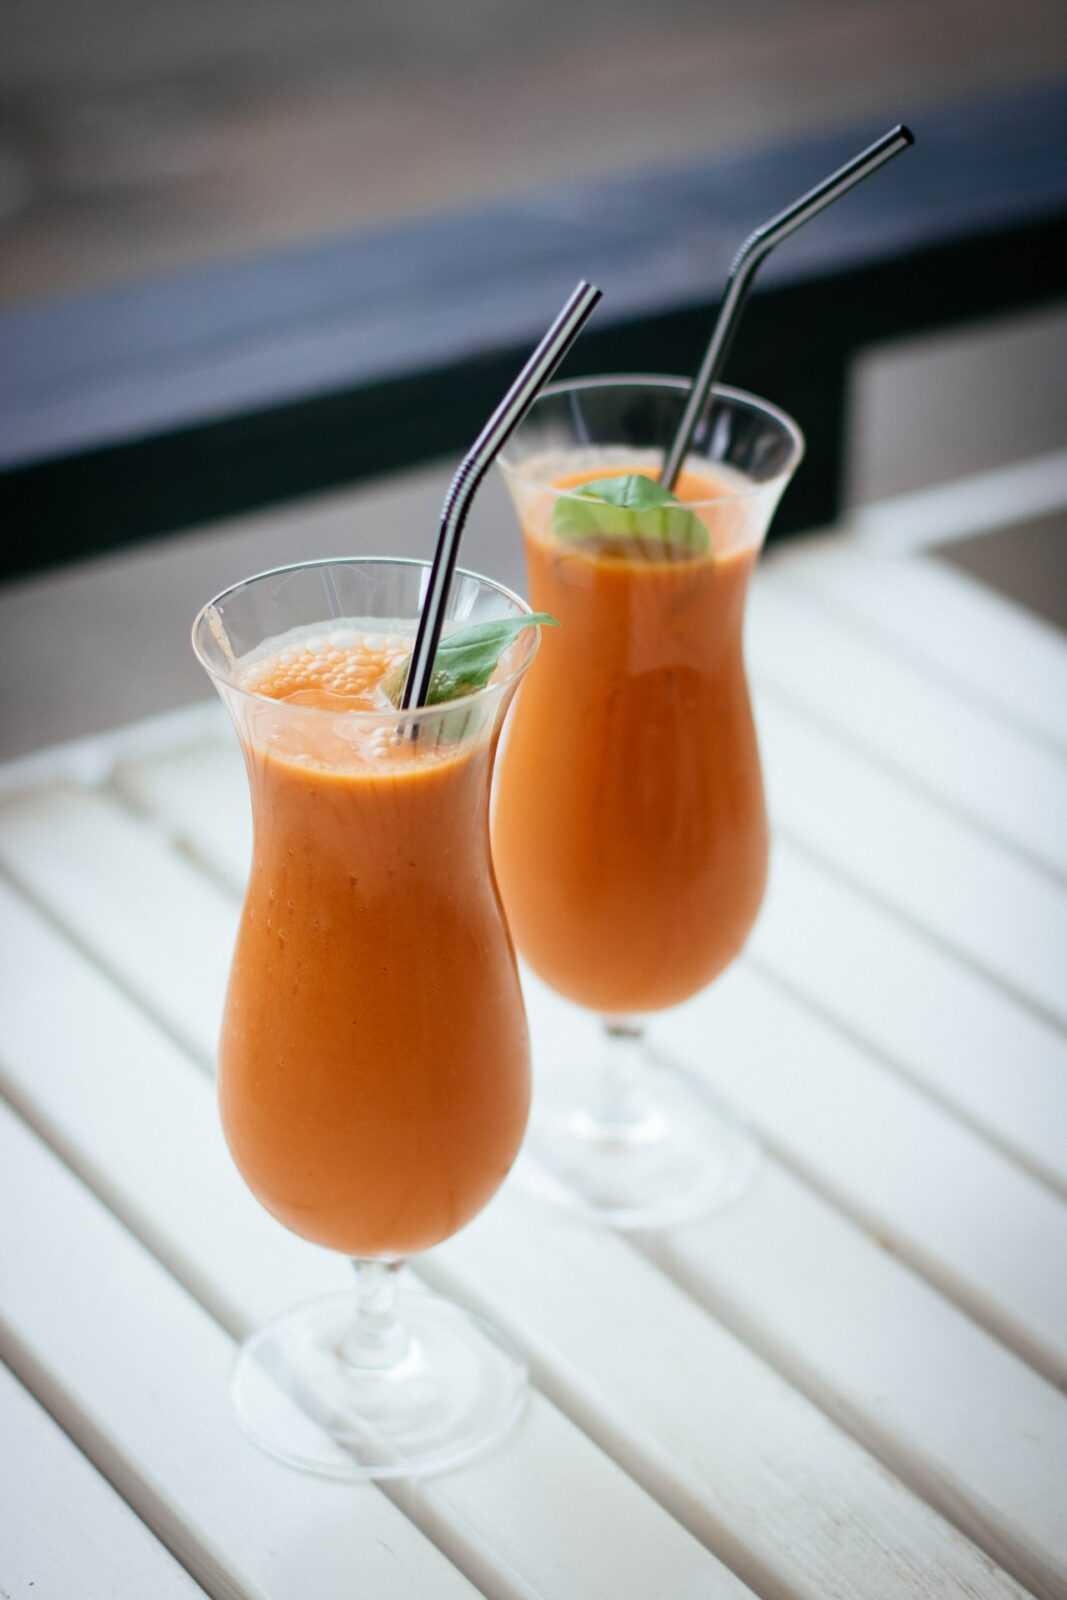 batido pera naranja y arandano rojo